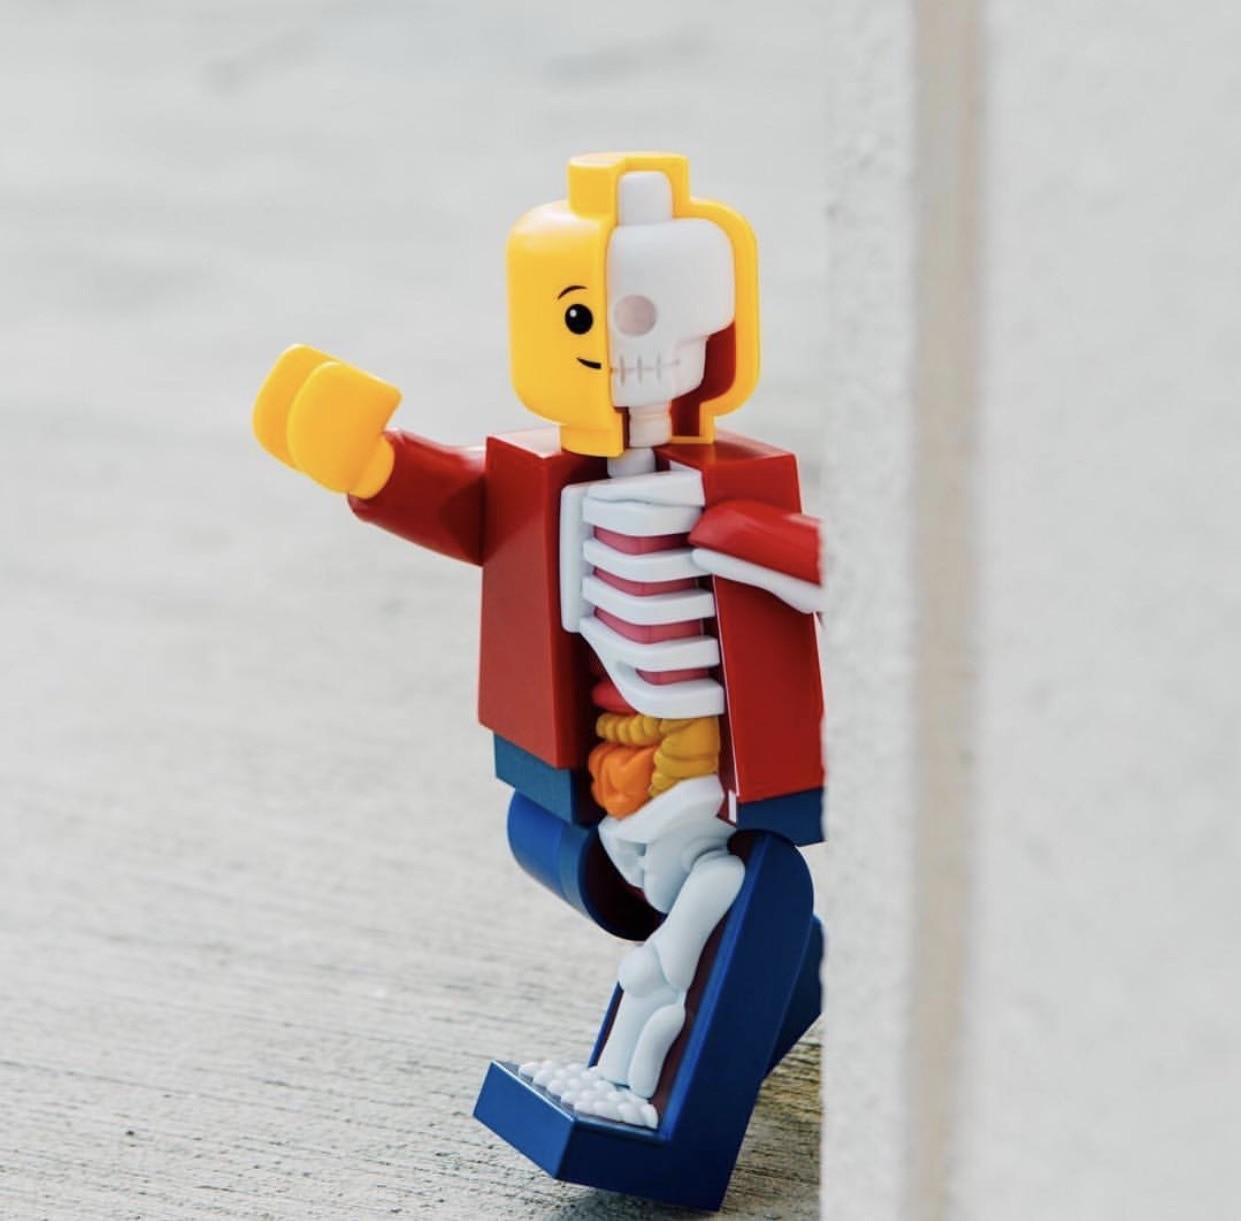 Big Micro Anatomic XXRAY JASON FREENY Brick Man 11 Inch With Movable Joints